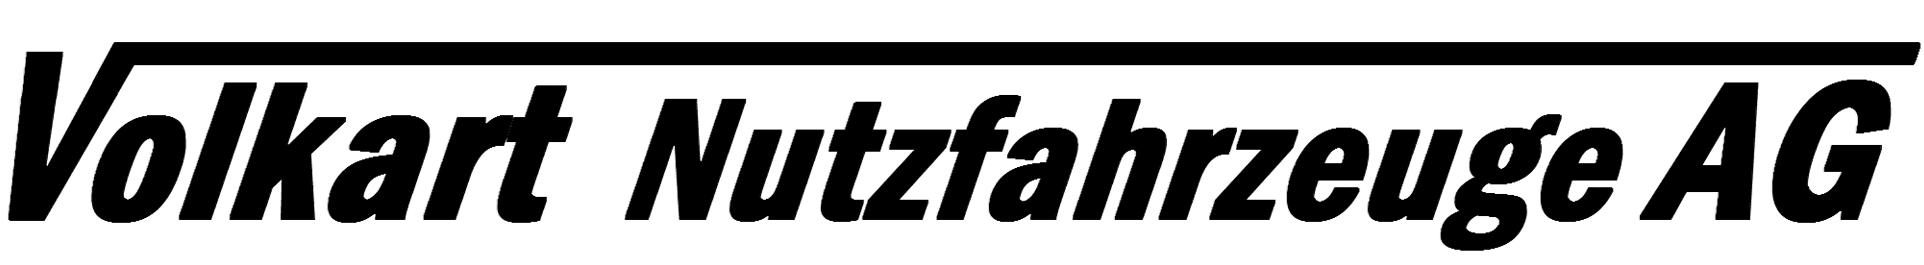 Logo Volkart Nutzfahrzeuge